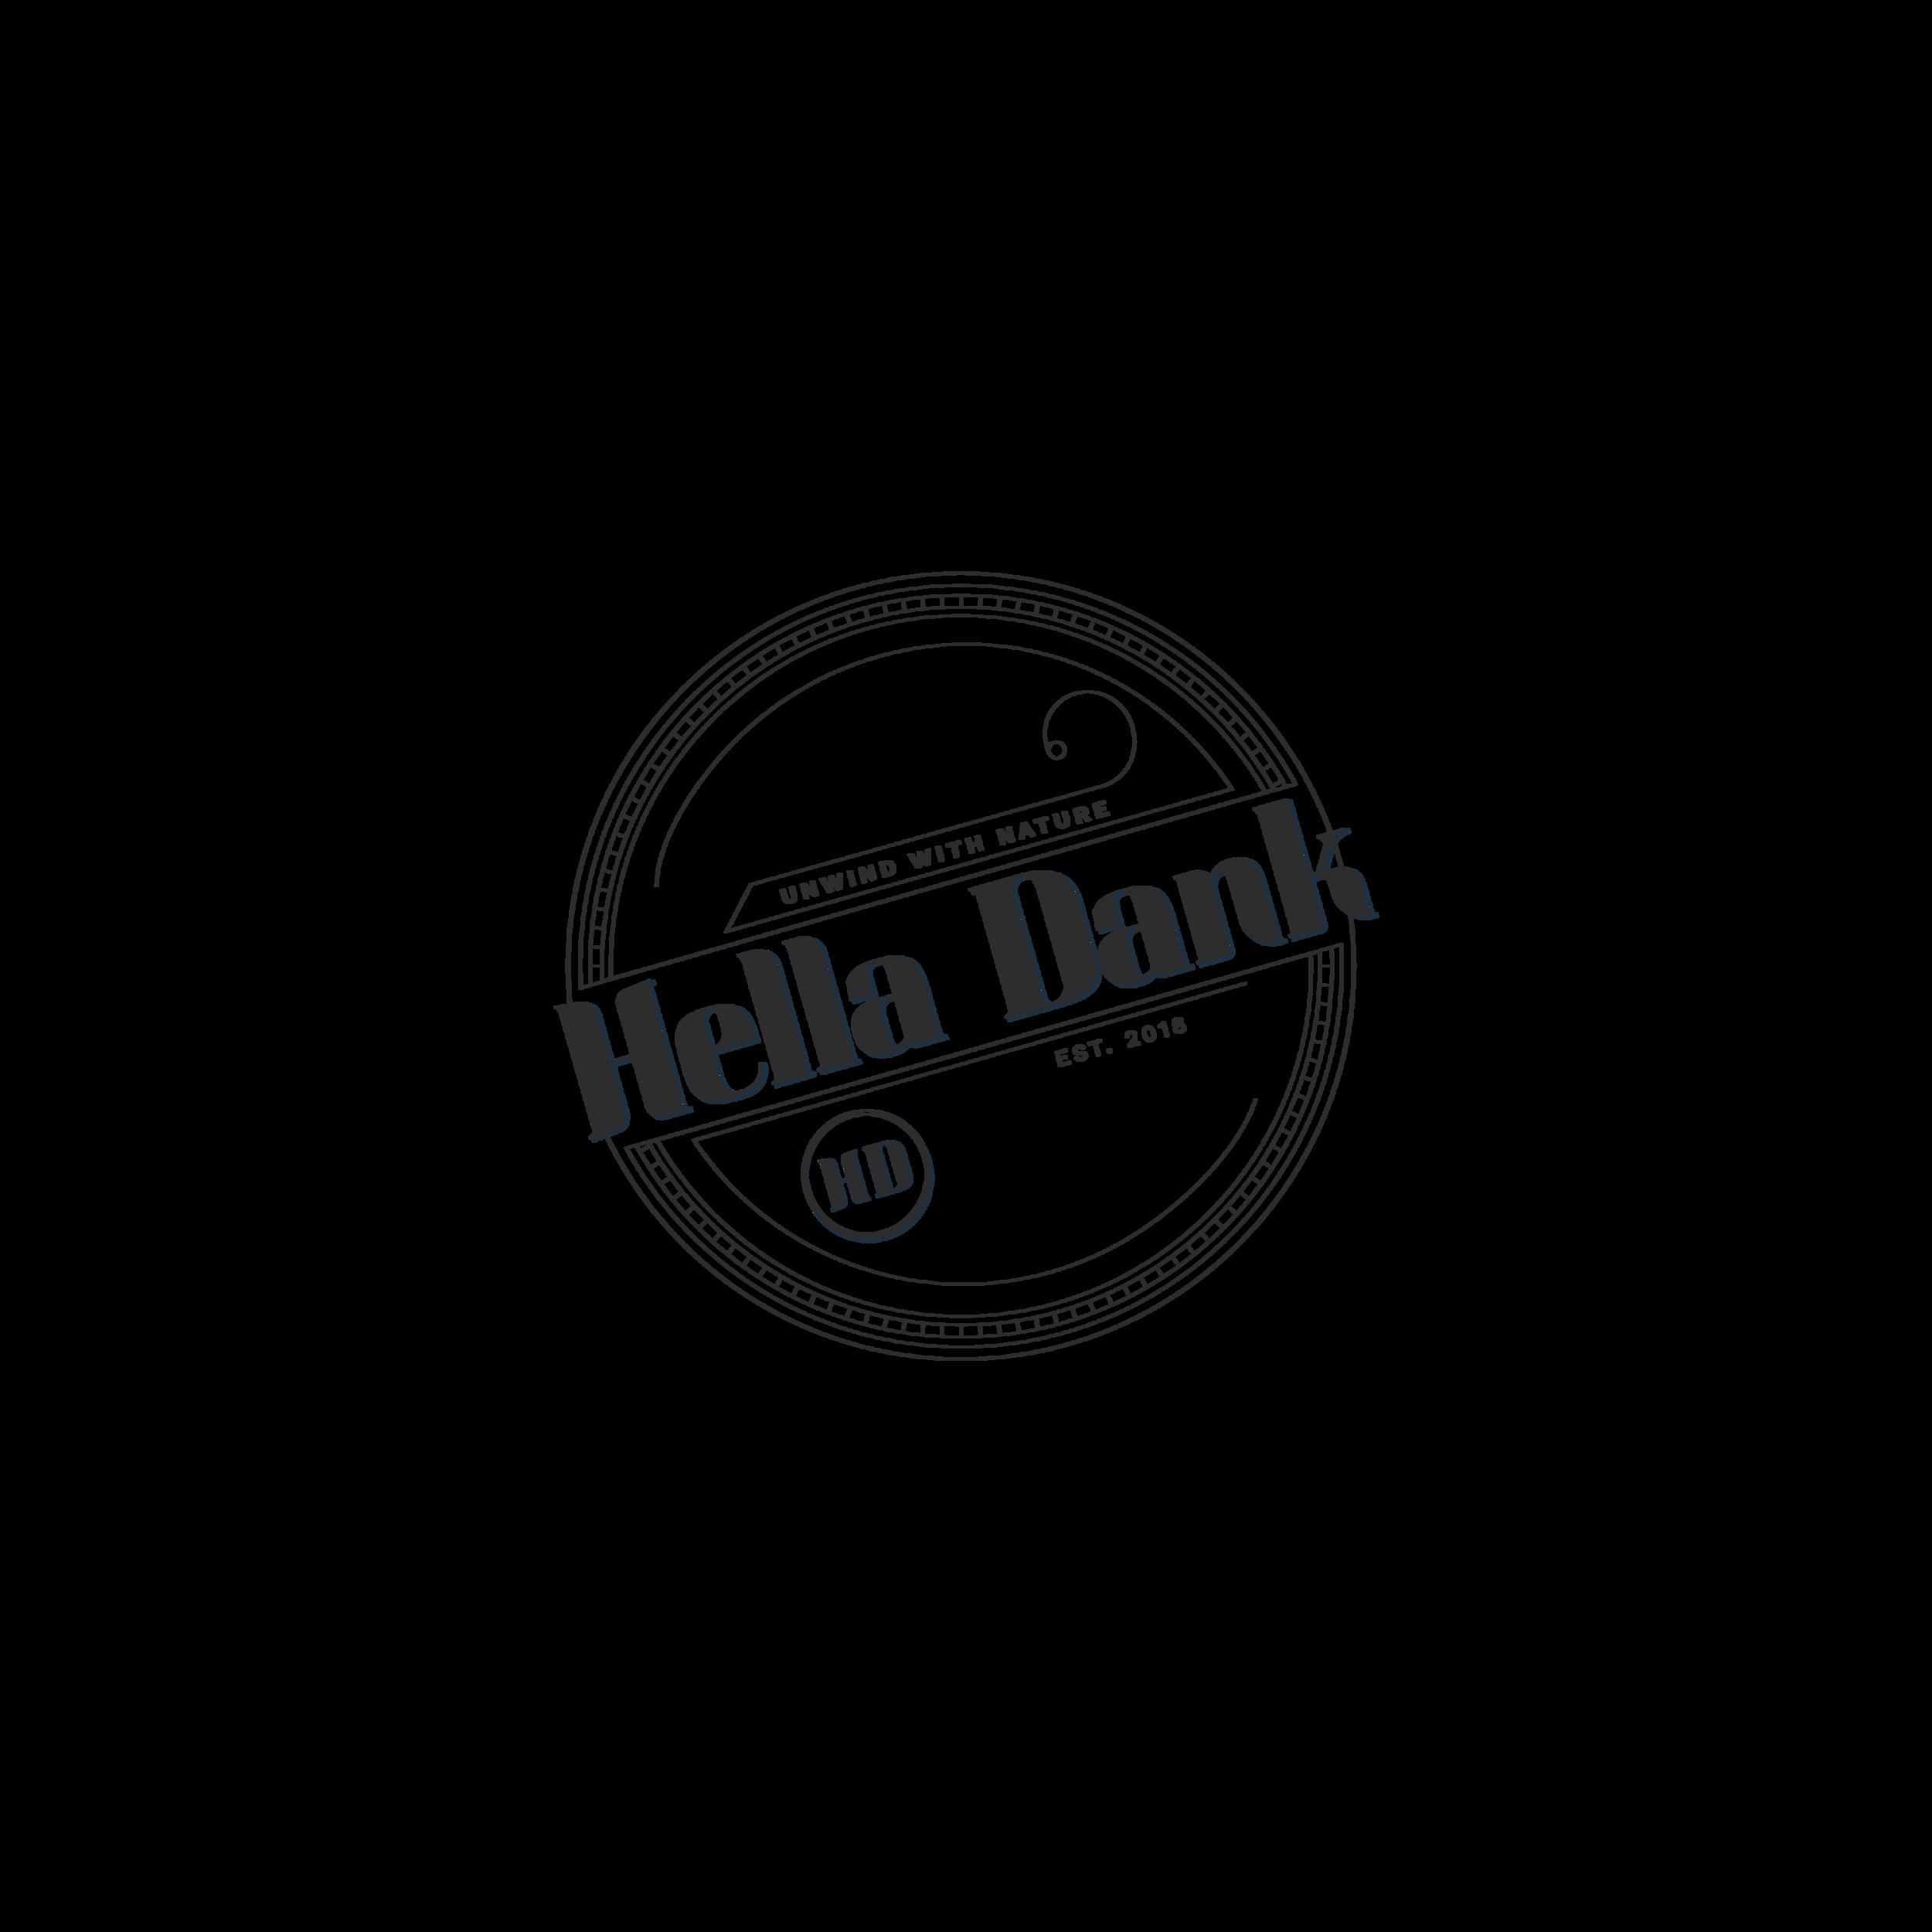 HellaDank_Primary-Logo-Primary.png